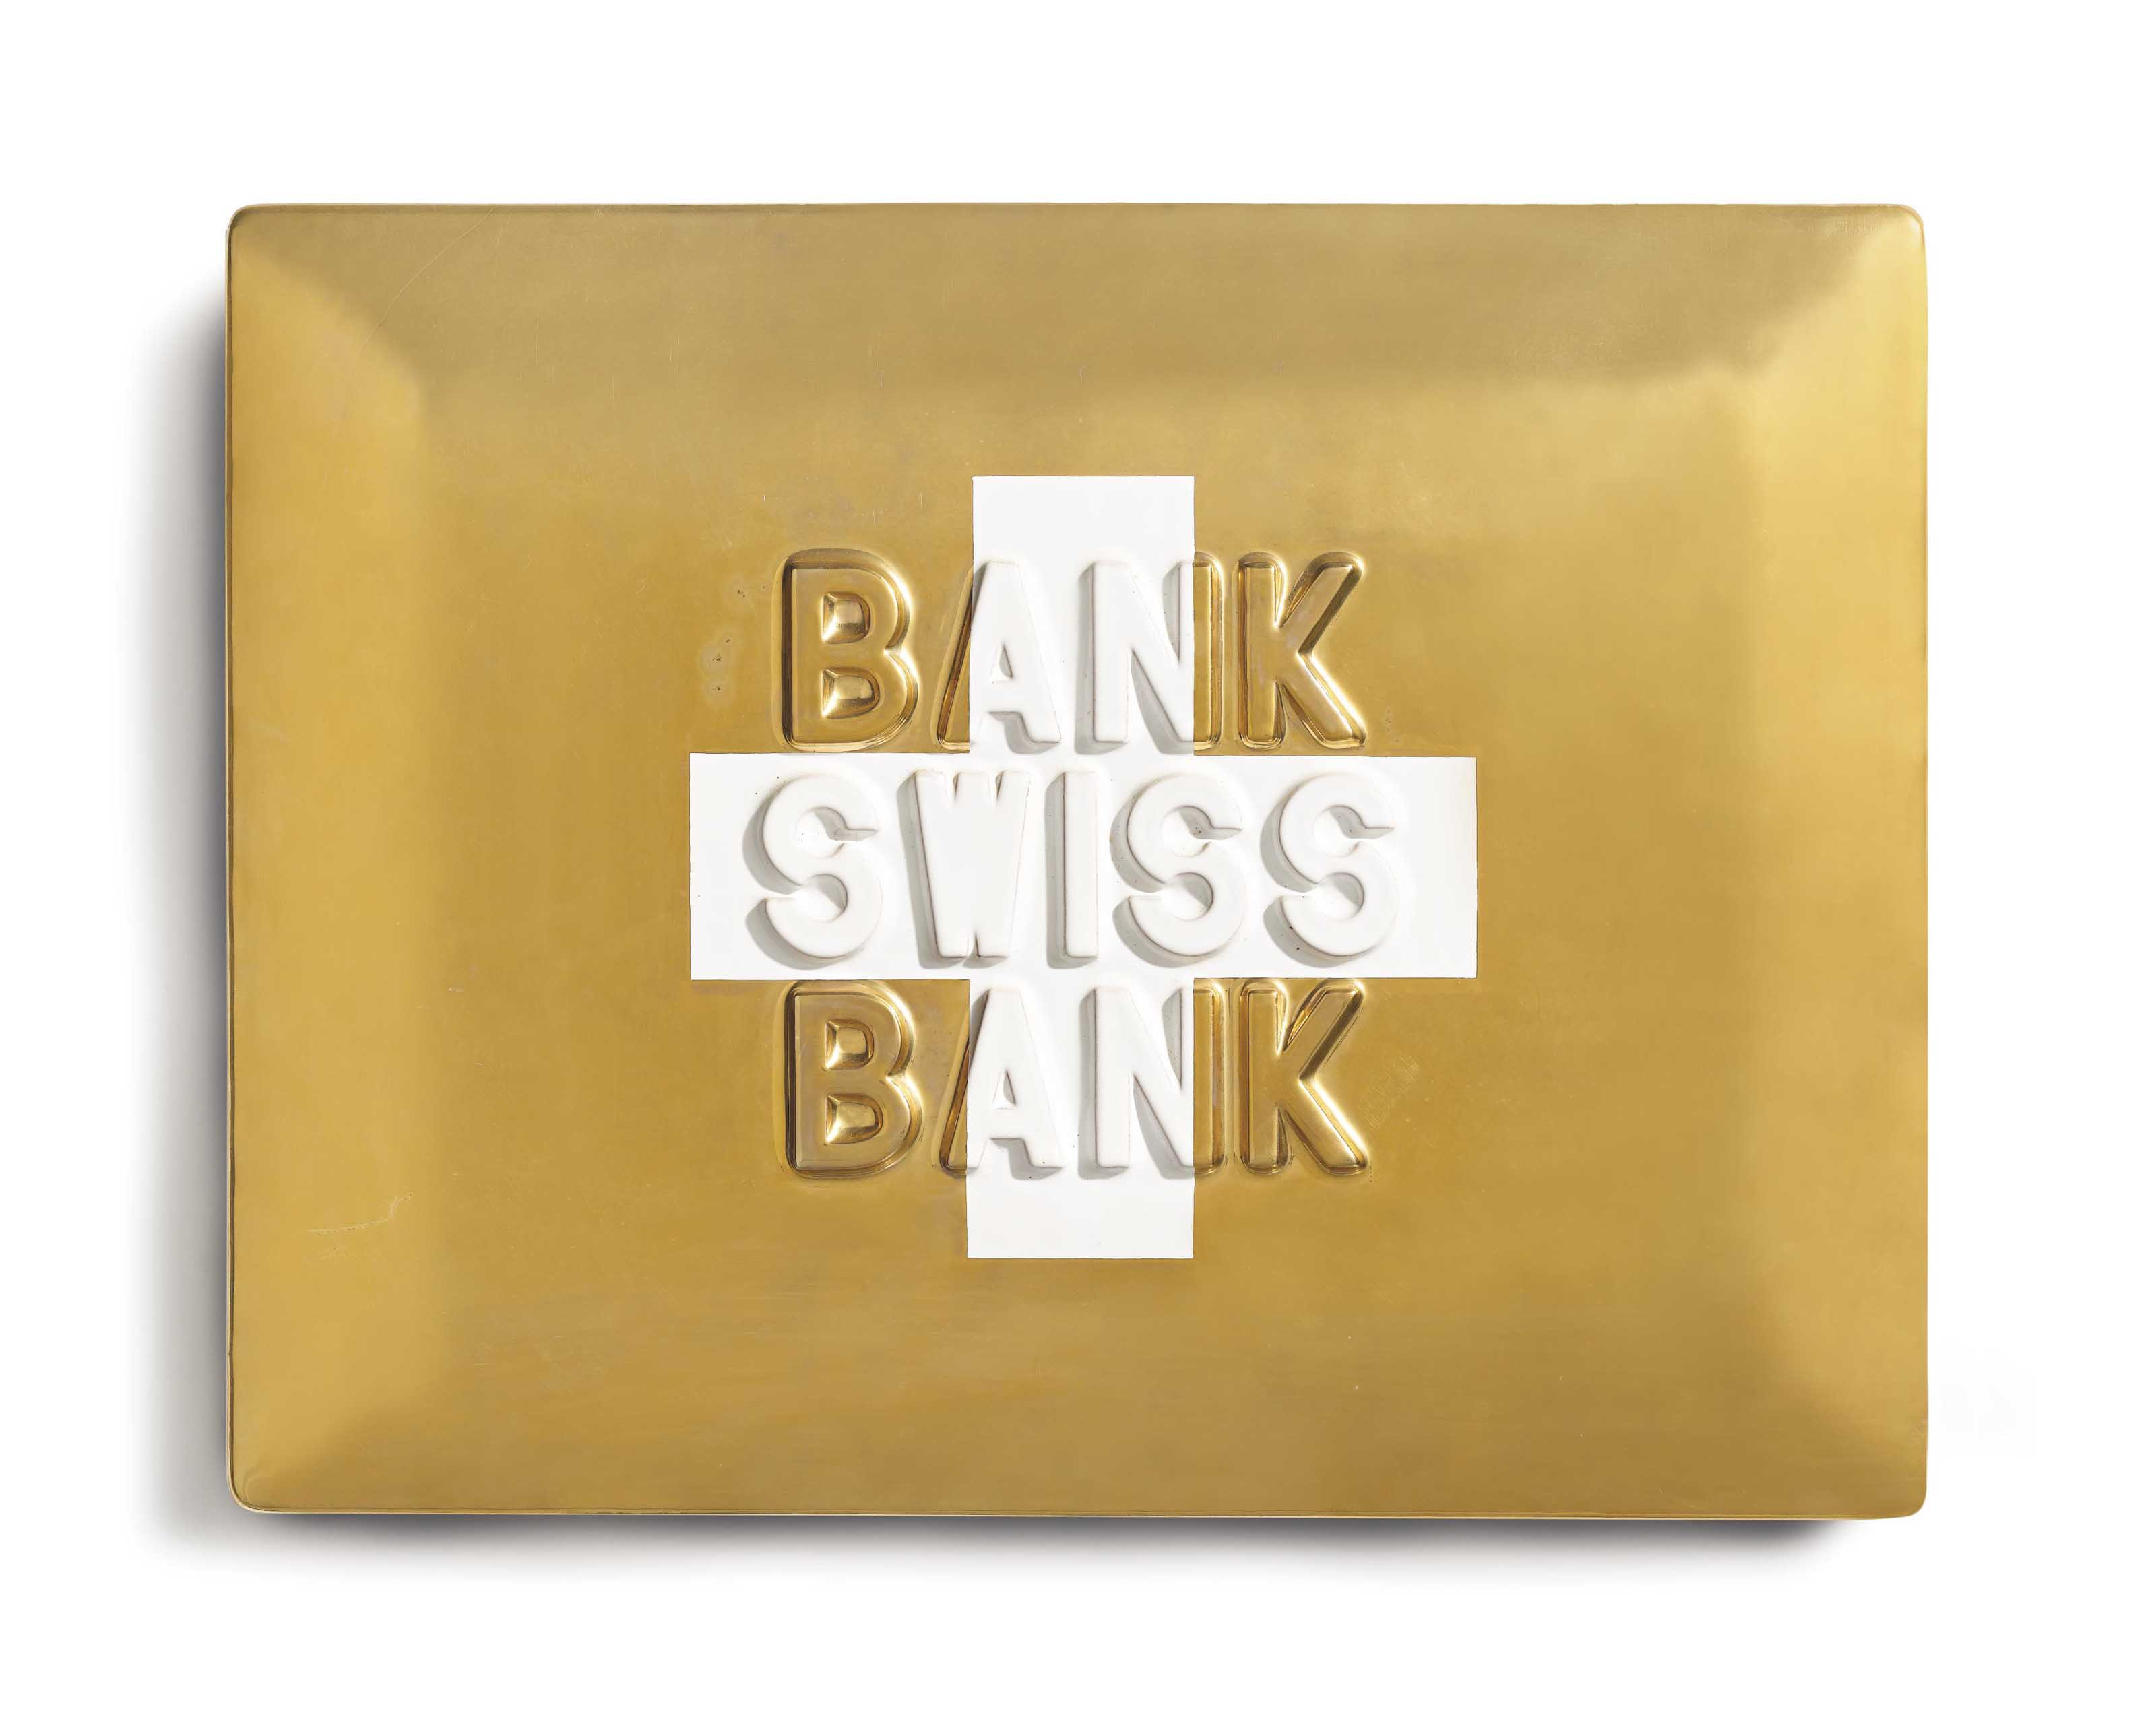 Bank Swiss Bank